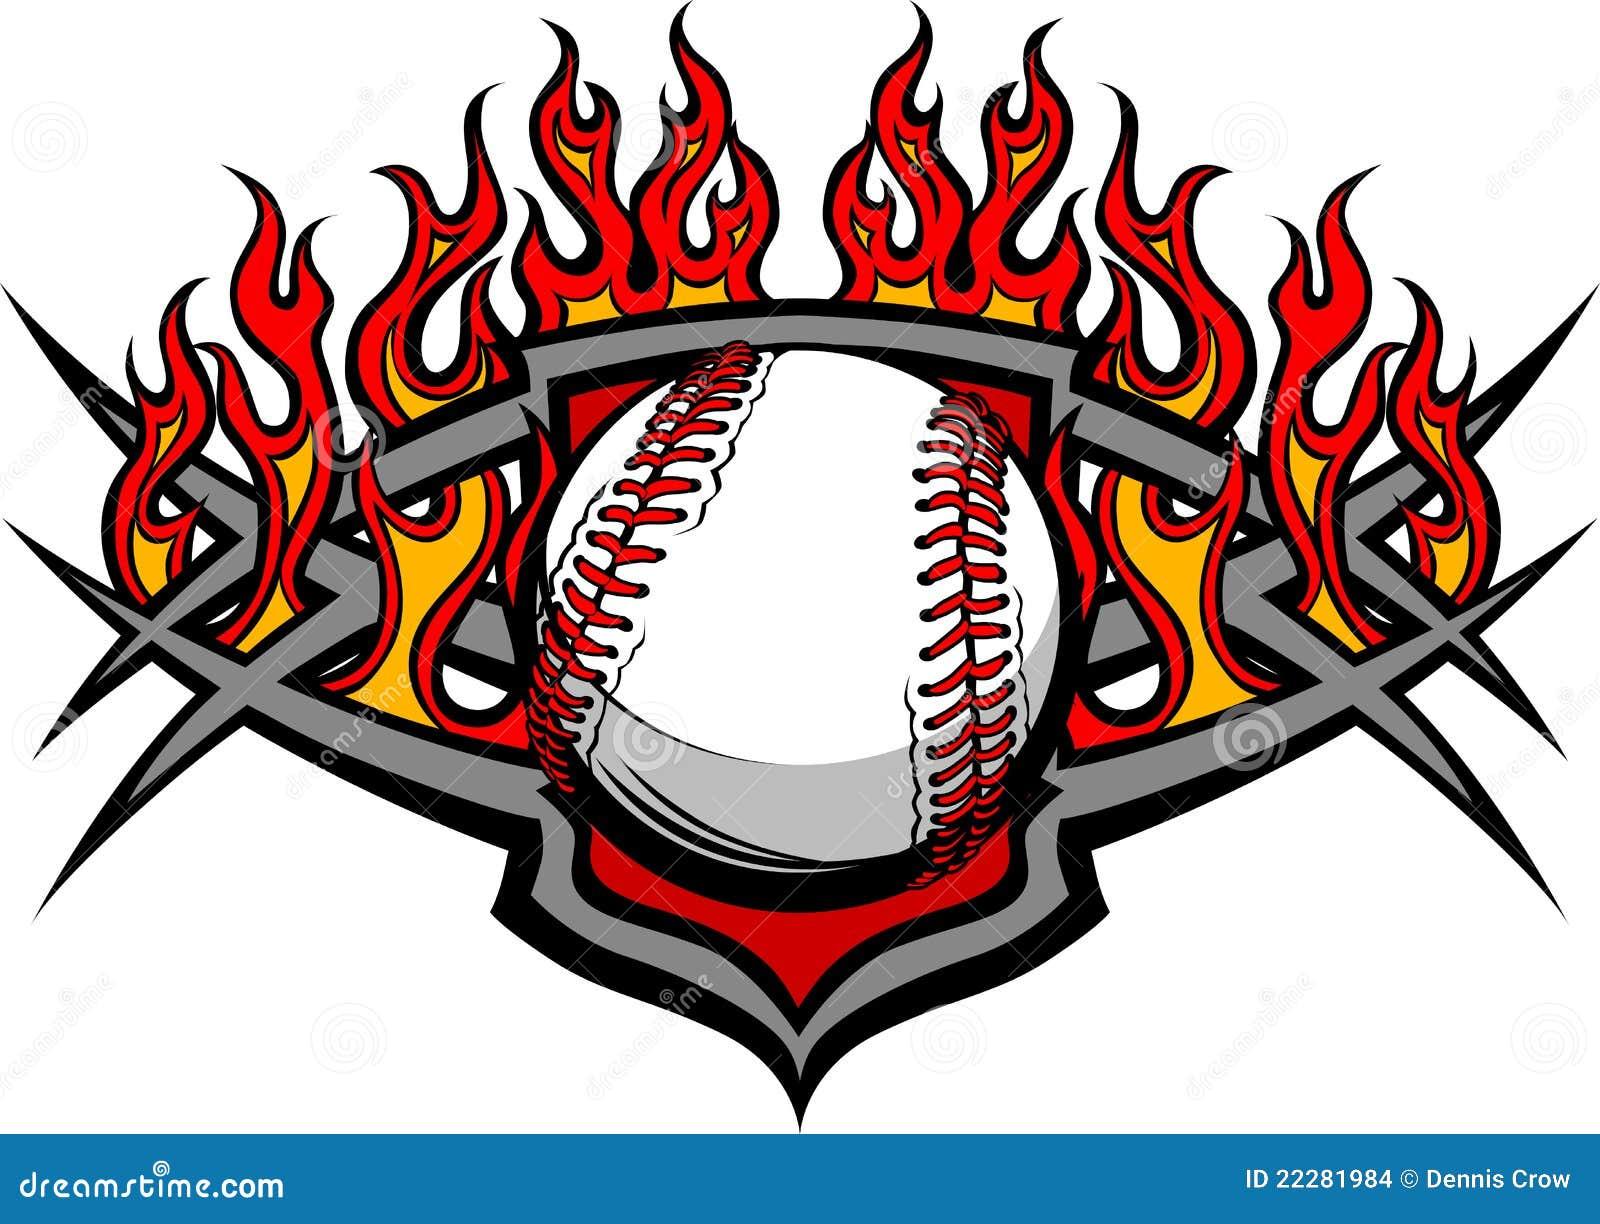 baseball stock illustrations 30 469 baseball stock illustrations